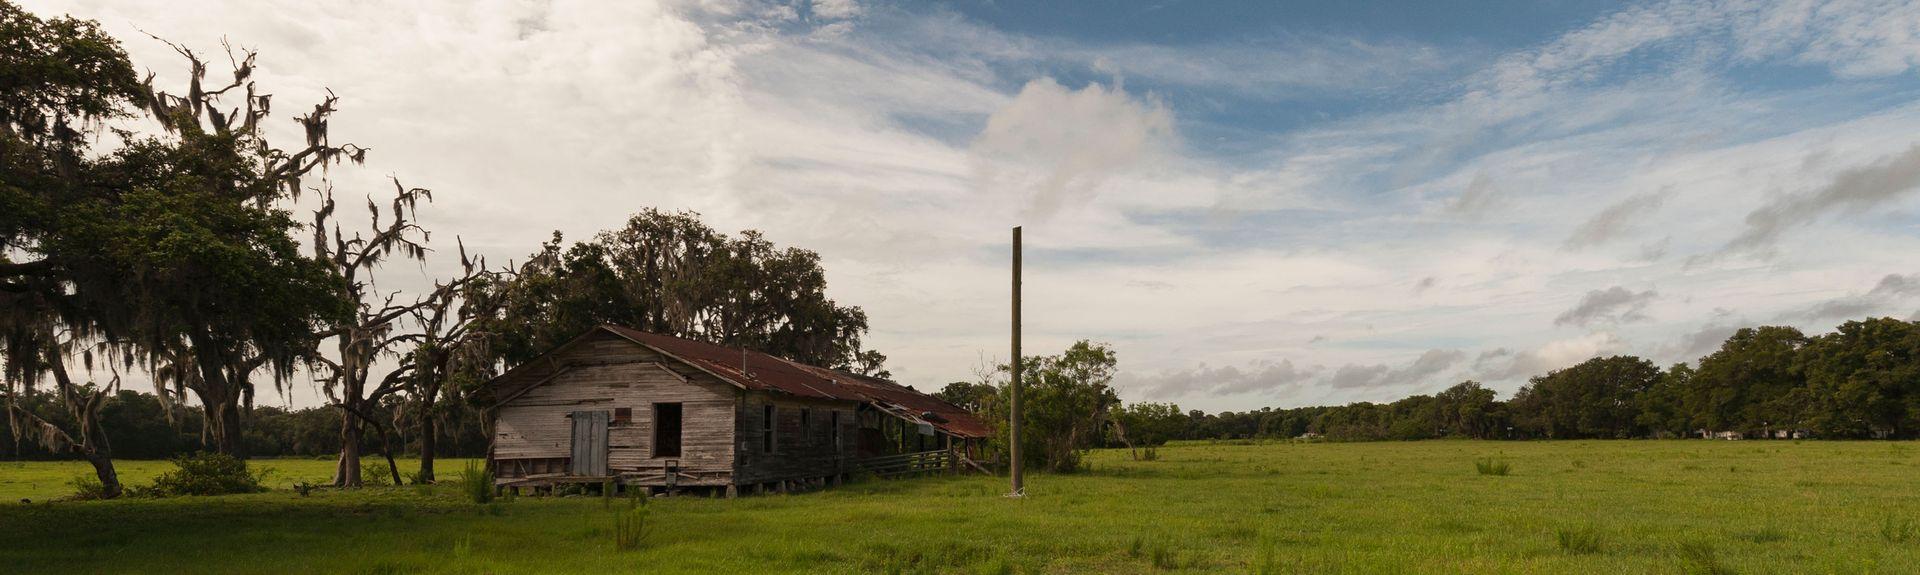 Wildwood, Florida, United States